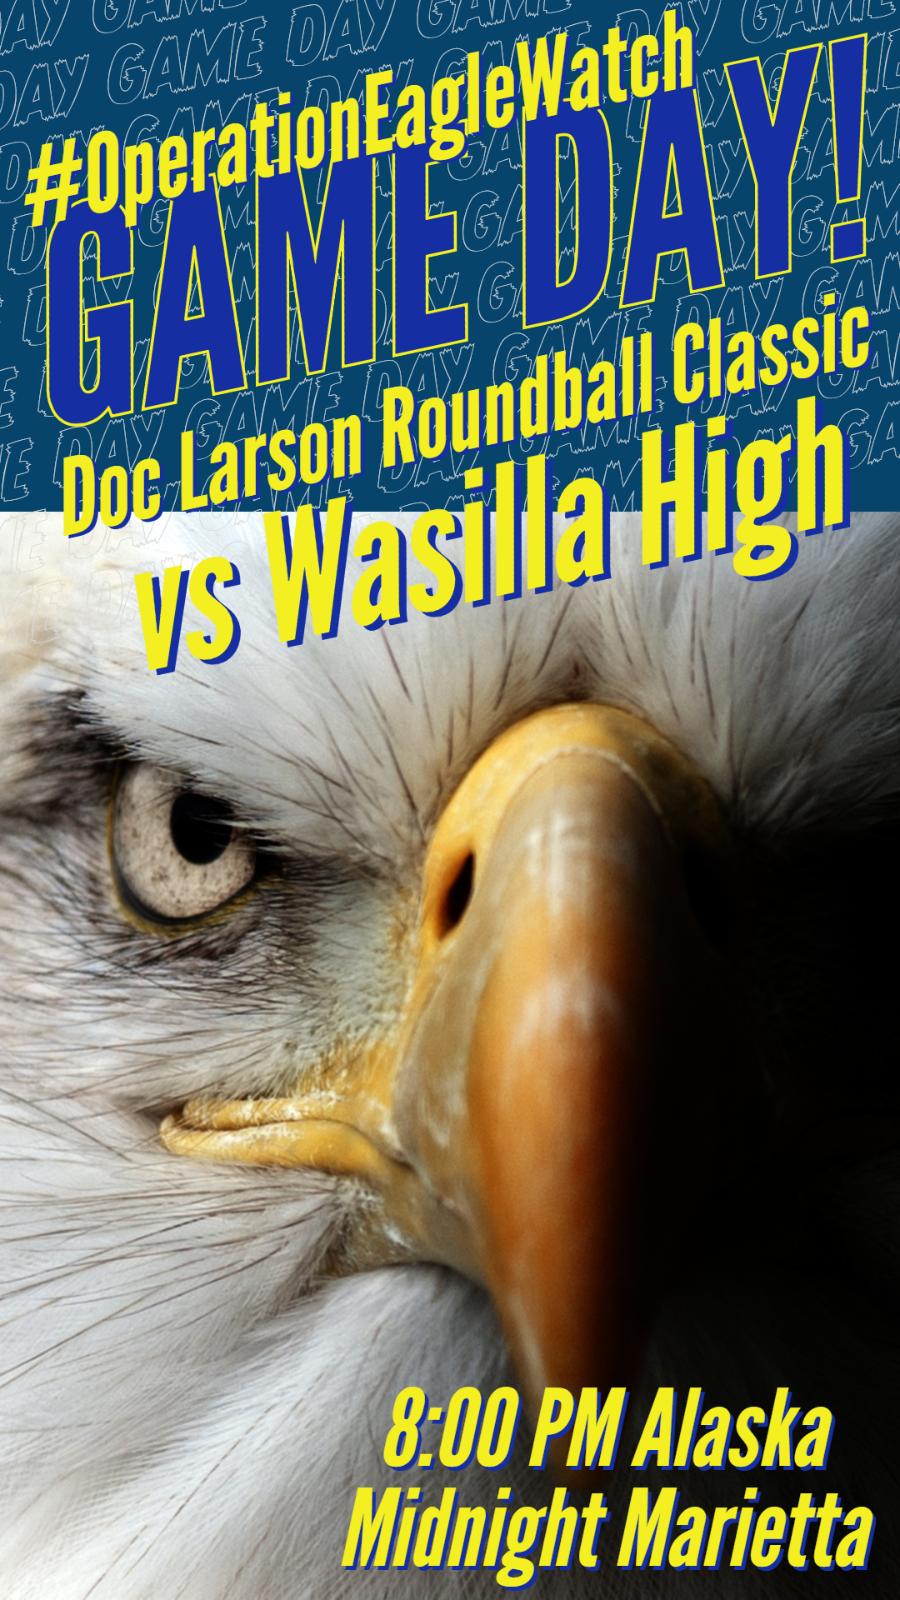 GAMEDAY: Day Two Doc Larson Roundball Classic